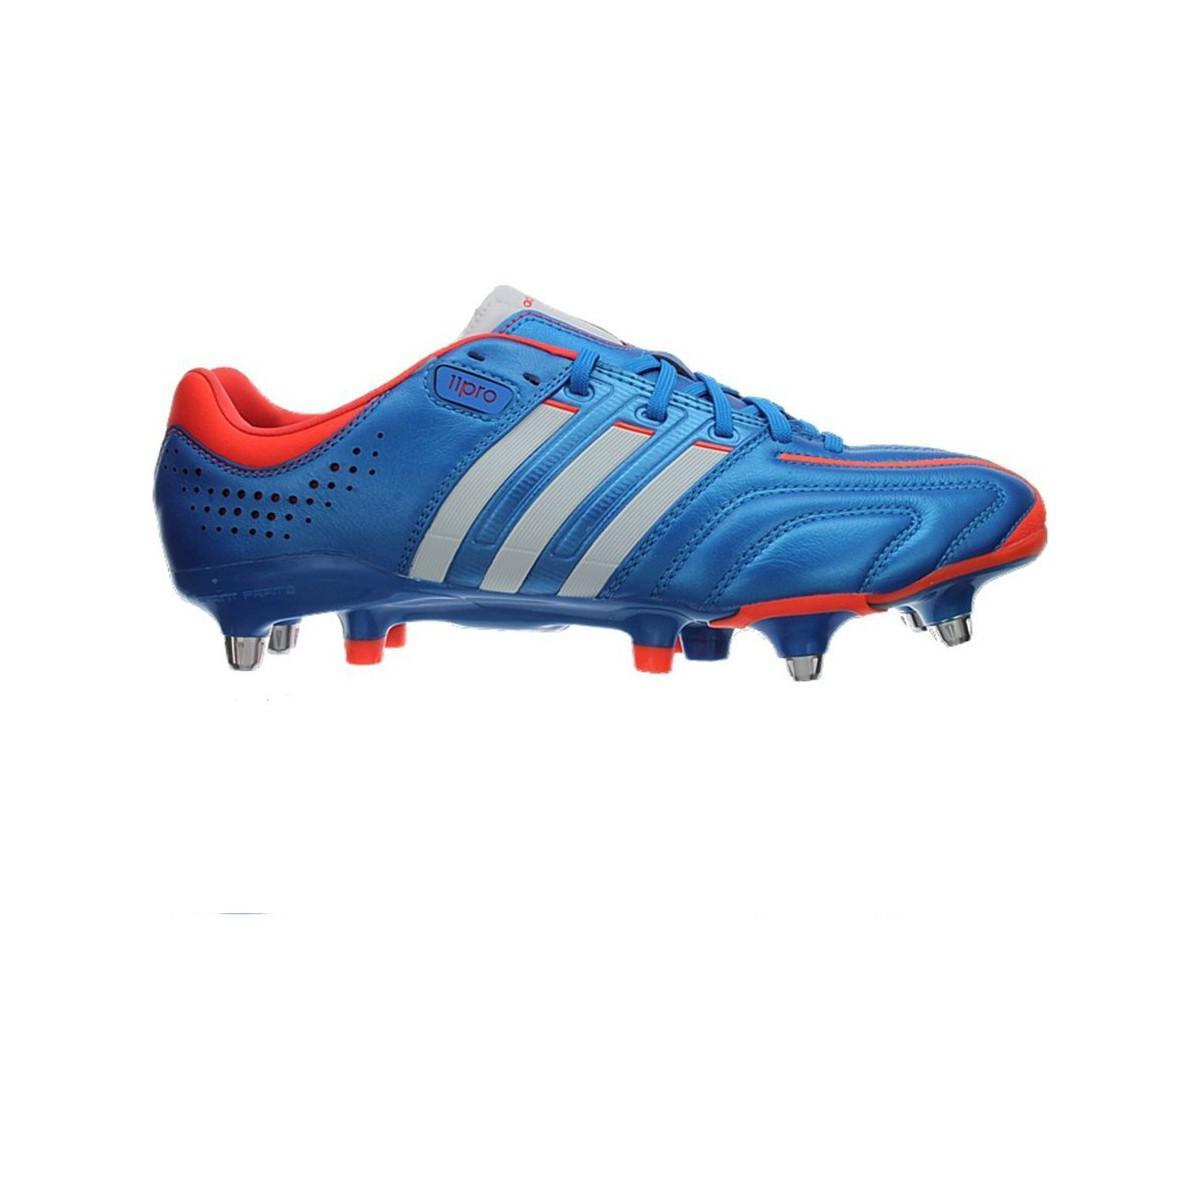 ed77d065a8c sale clearance adidas adipure 11pro trx ic kaka v soccer cleats men blue  white red 7qjyyffq 5ba84 89c7c  promo code adidas. adipure 11pro d9f55 b58a7